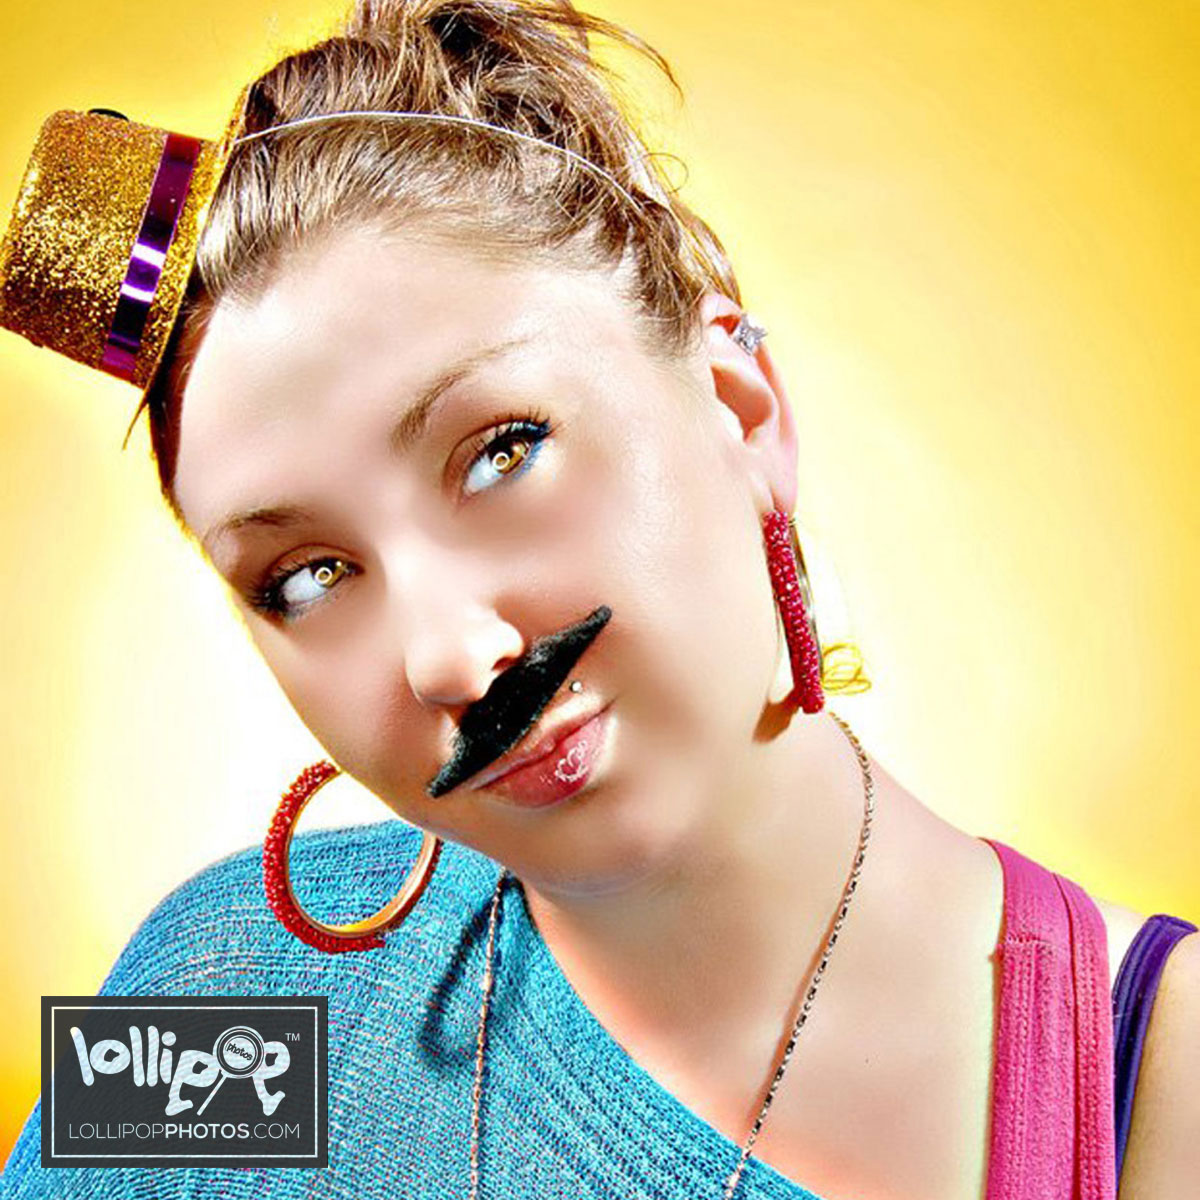 msdig-nora-canfield-lollipop-photos-101.jpg